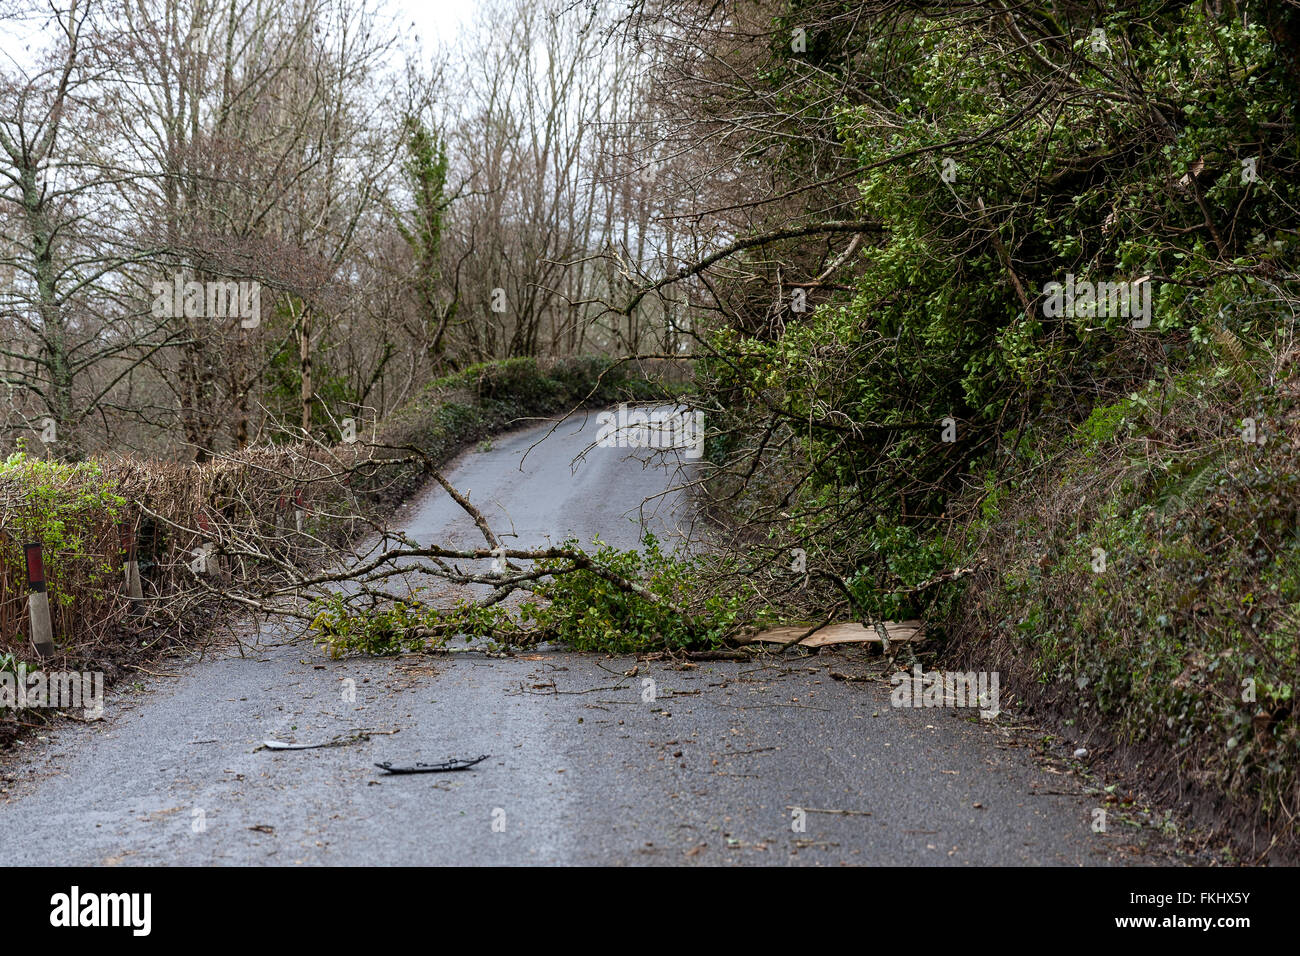 Trusham, Devon, UK. 09th Mar, 2016. High winds take down a tree in Devon. 11 AM Wednesday 9th march 2016, fallen - Stock Image